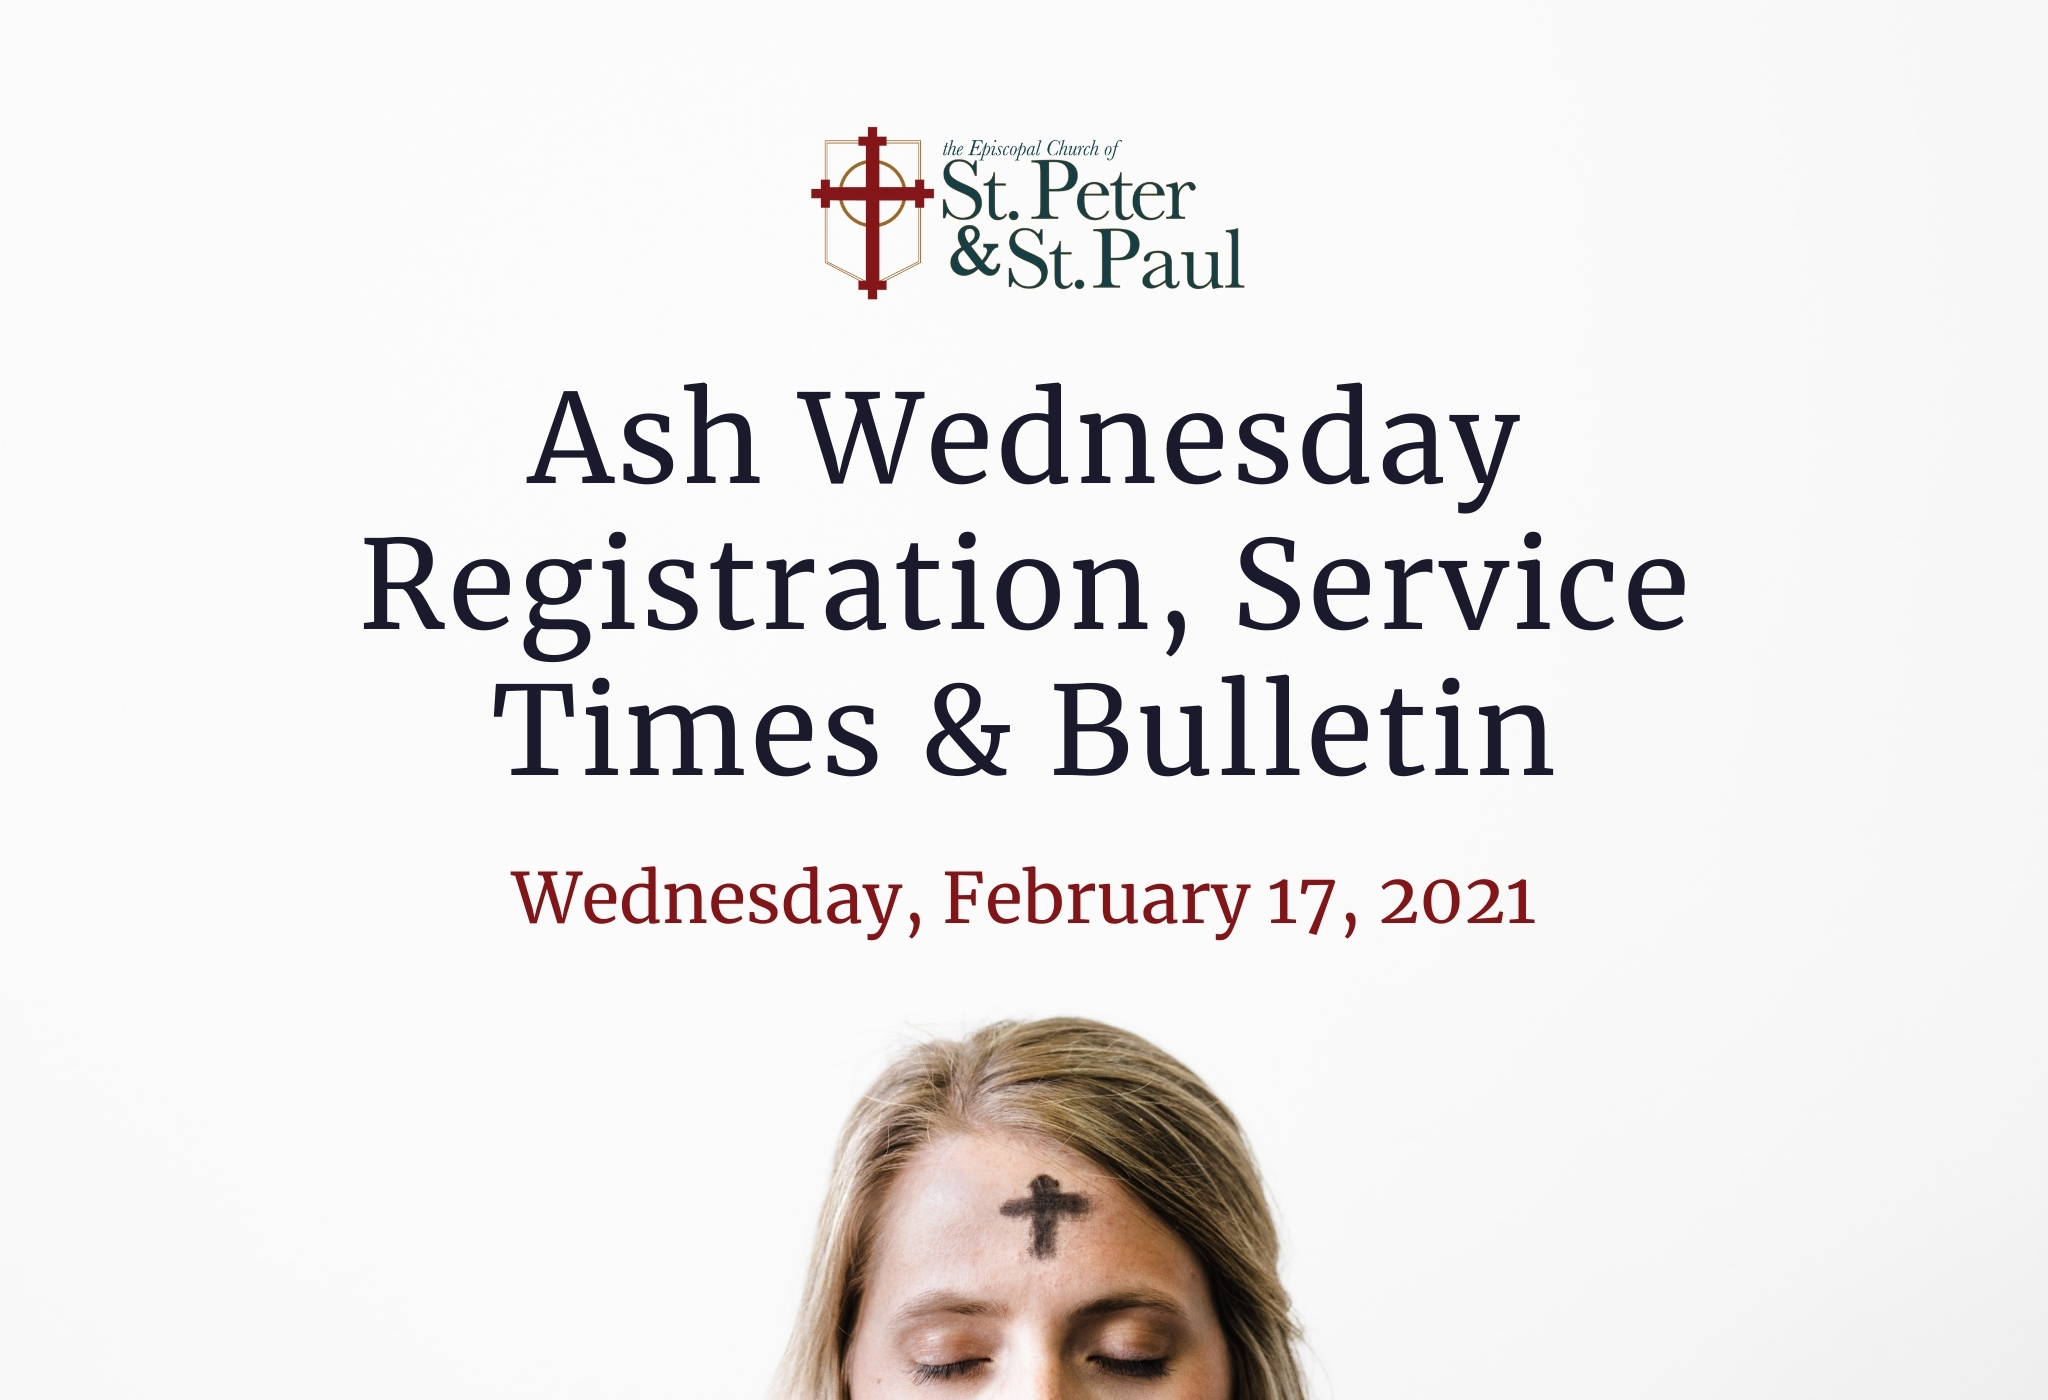 2021 Ash Wednesday Registration, Service Times & Bulletin